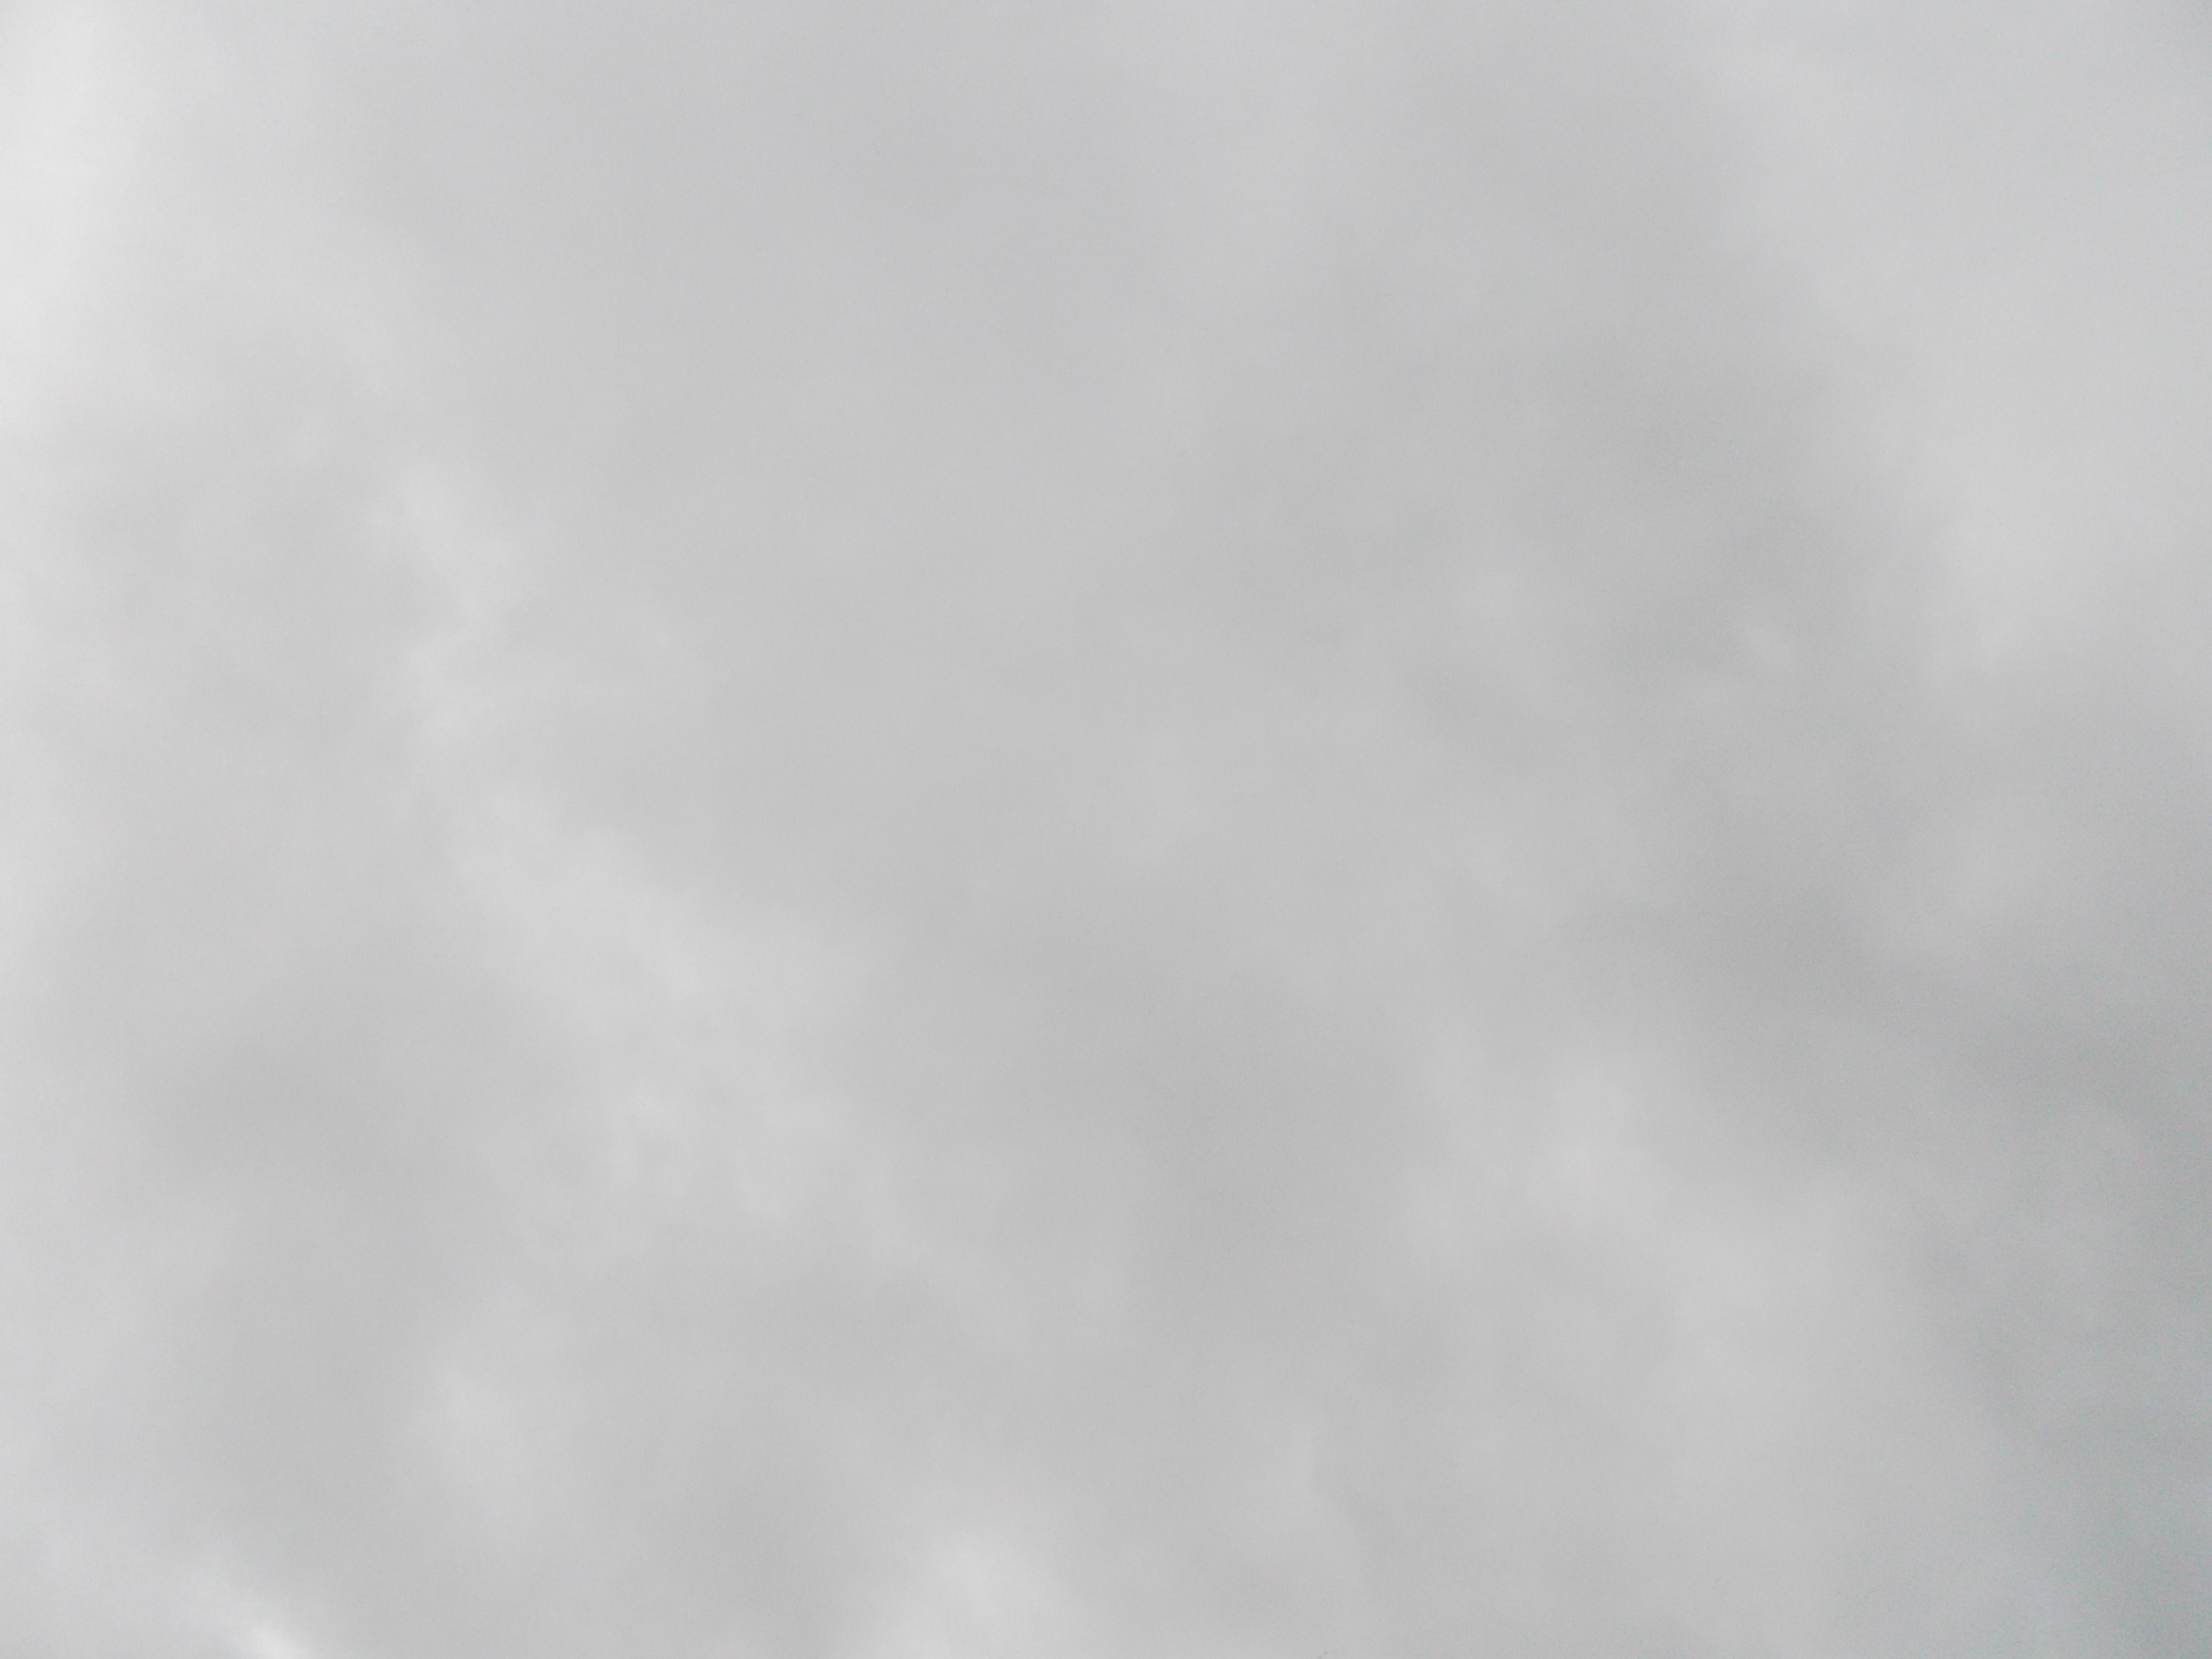 2013-01-29 Longitude -0.371 Latitude 49.182 Altitude 13 Heure 14h10